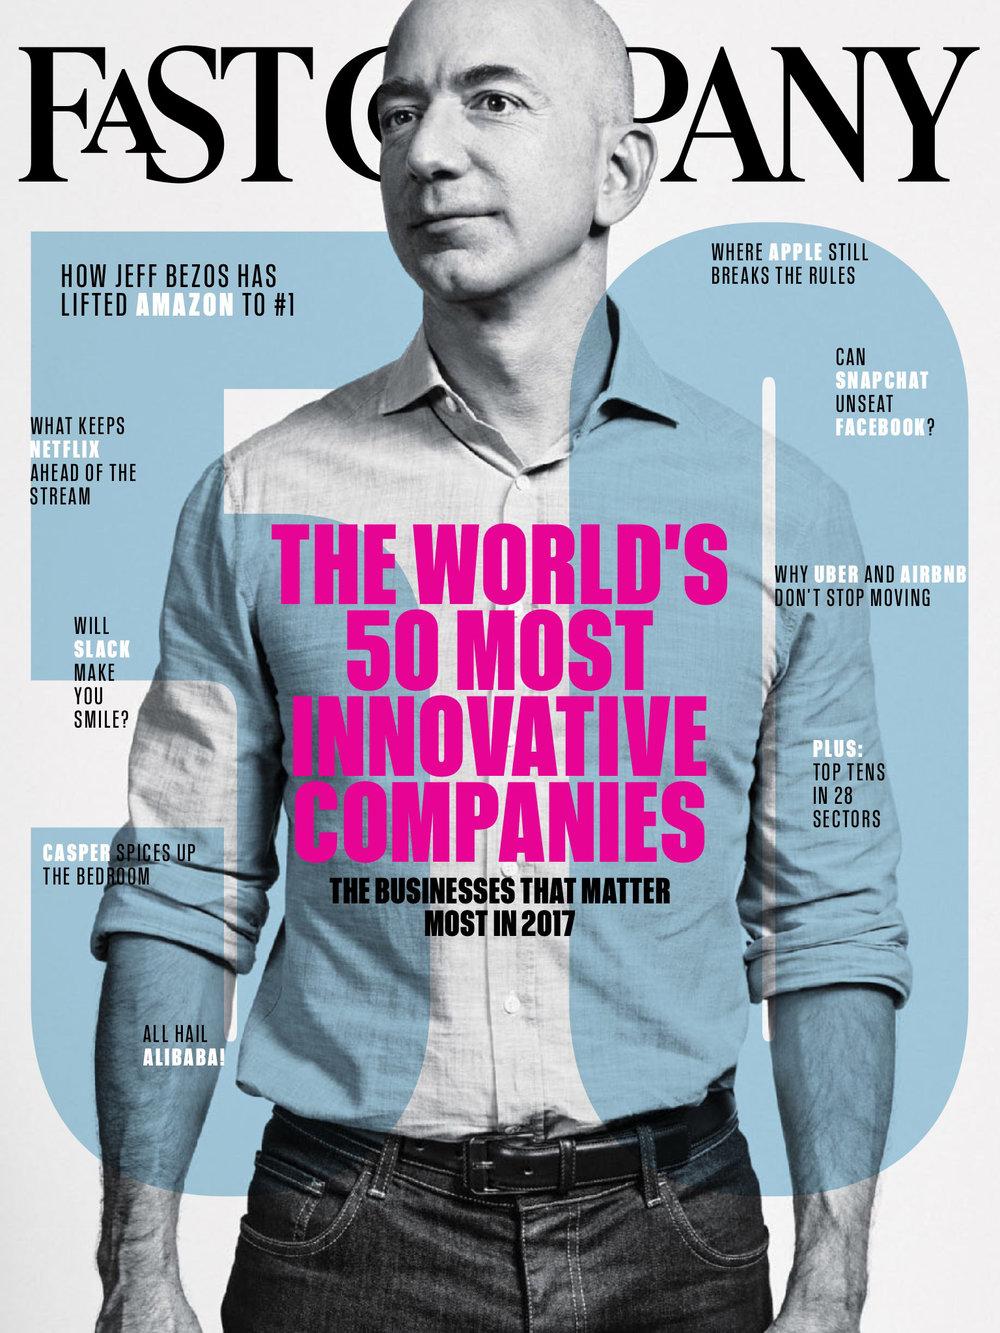 Fast Company March 2017 Cover